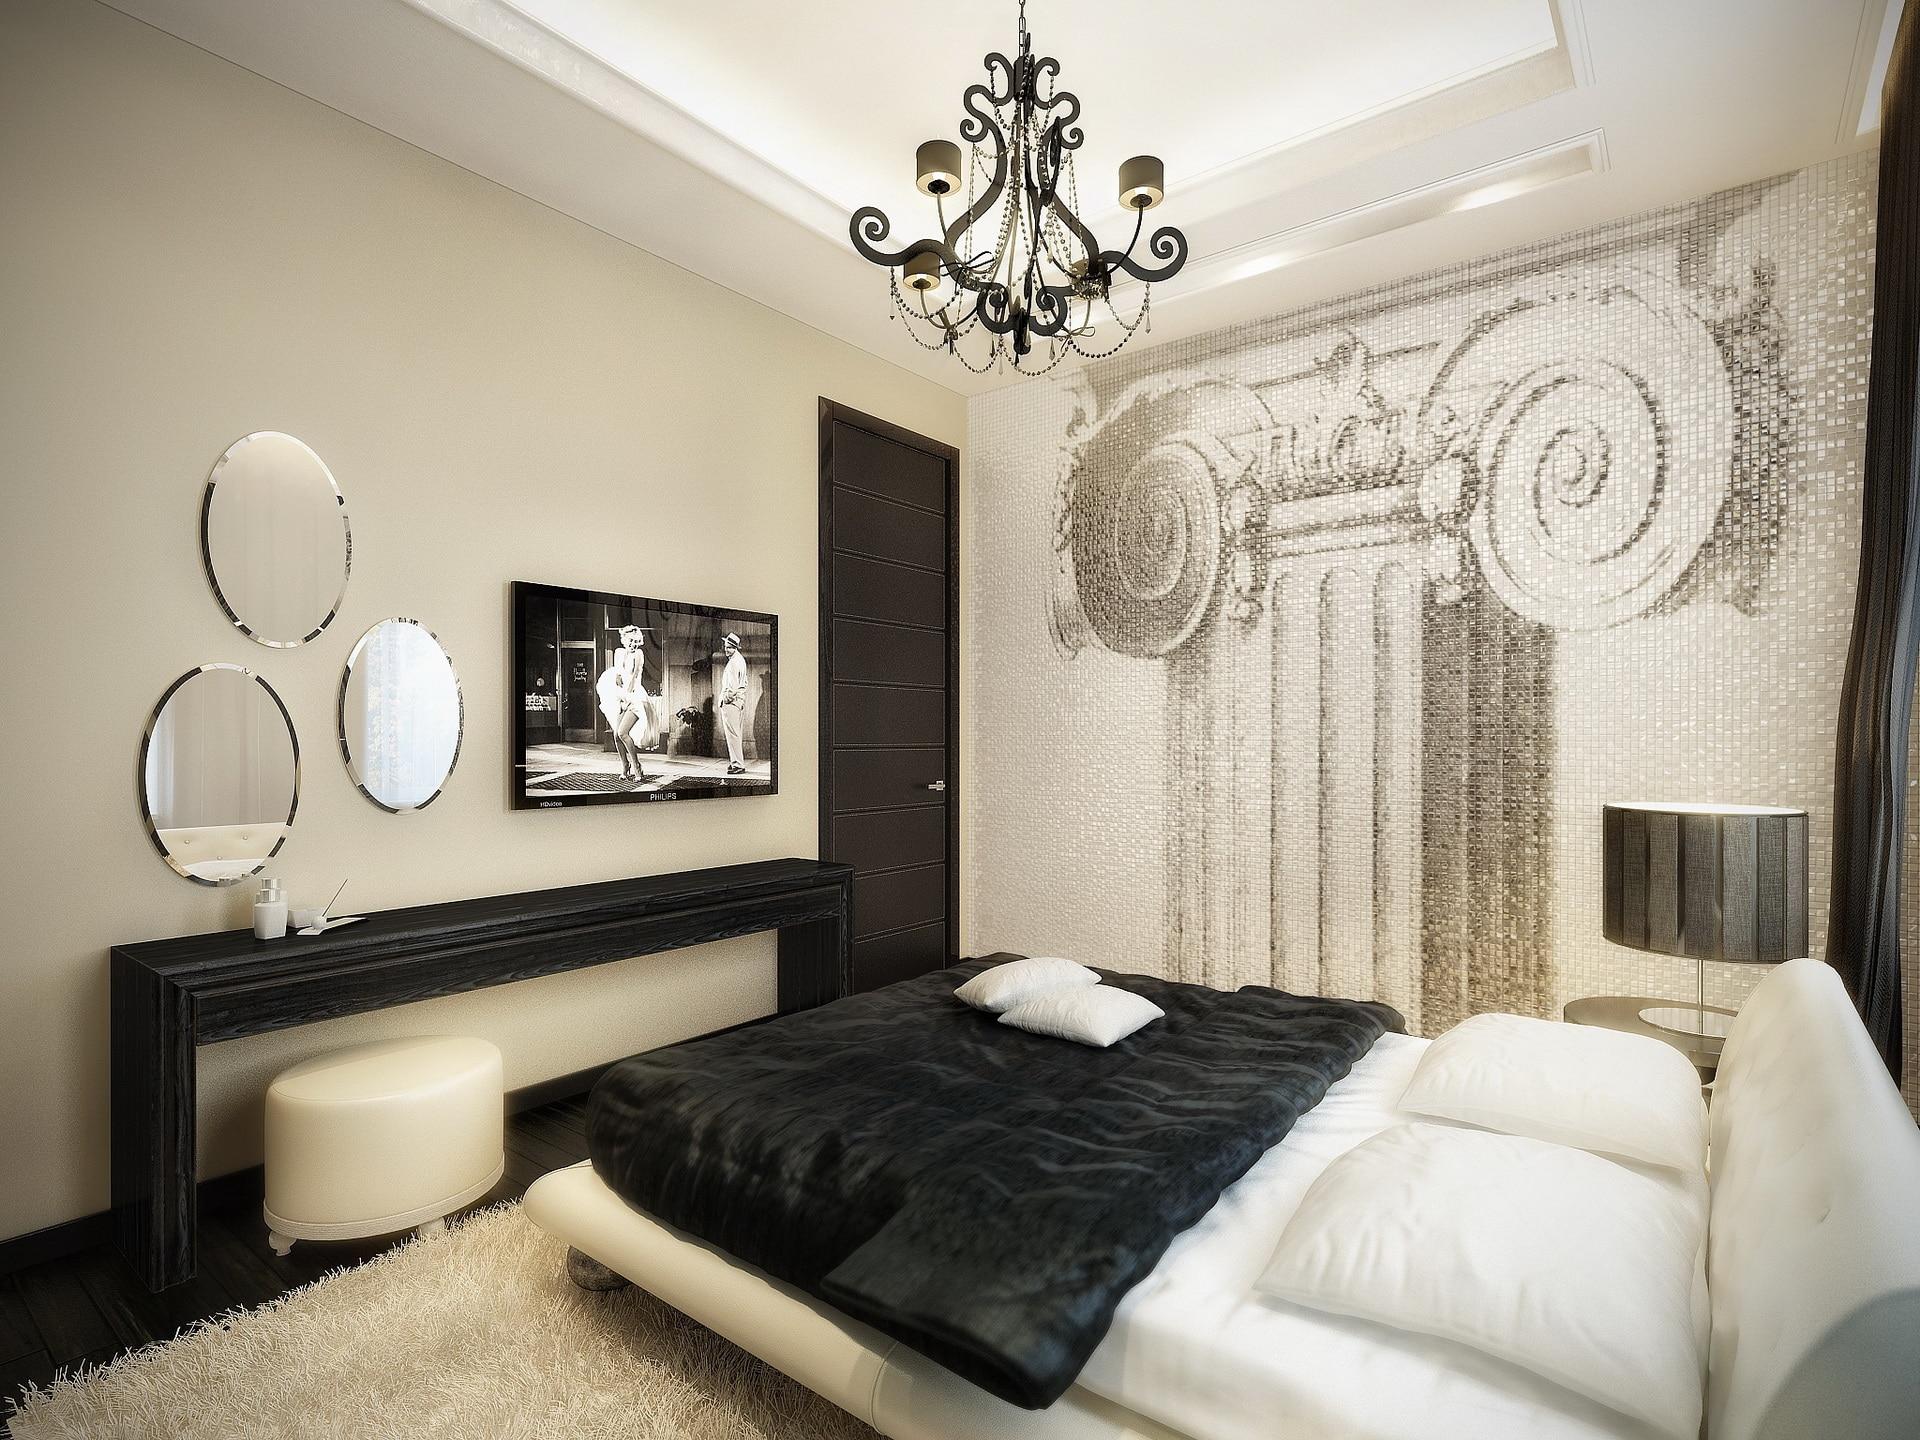 Dise o de paredes estilo retro construye hogar - Construye hogar ...